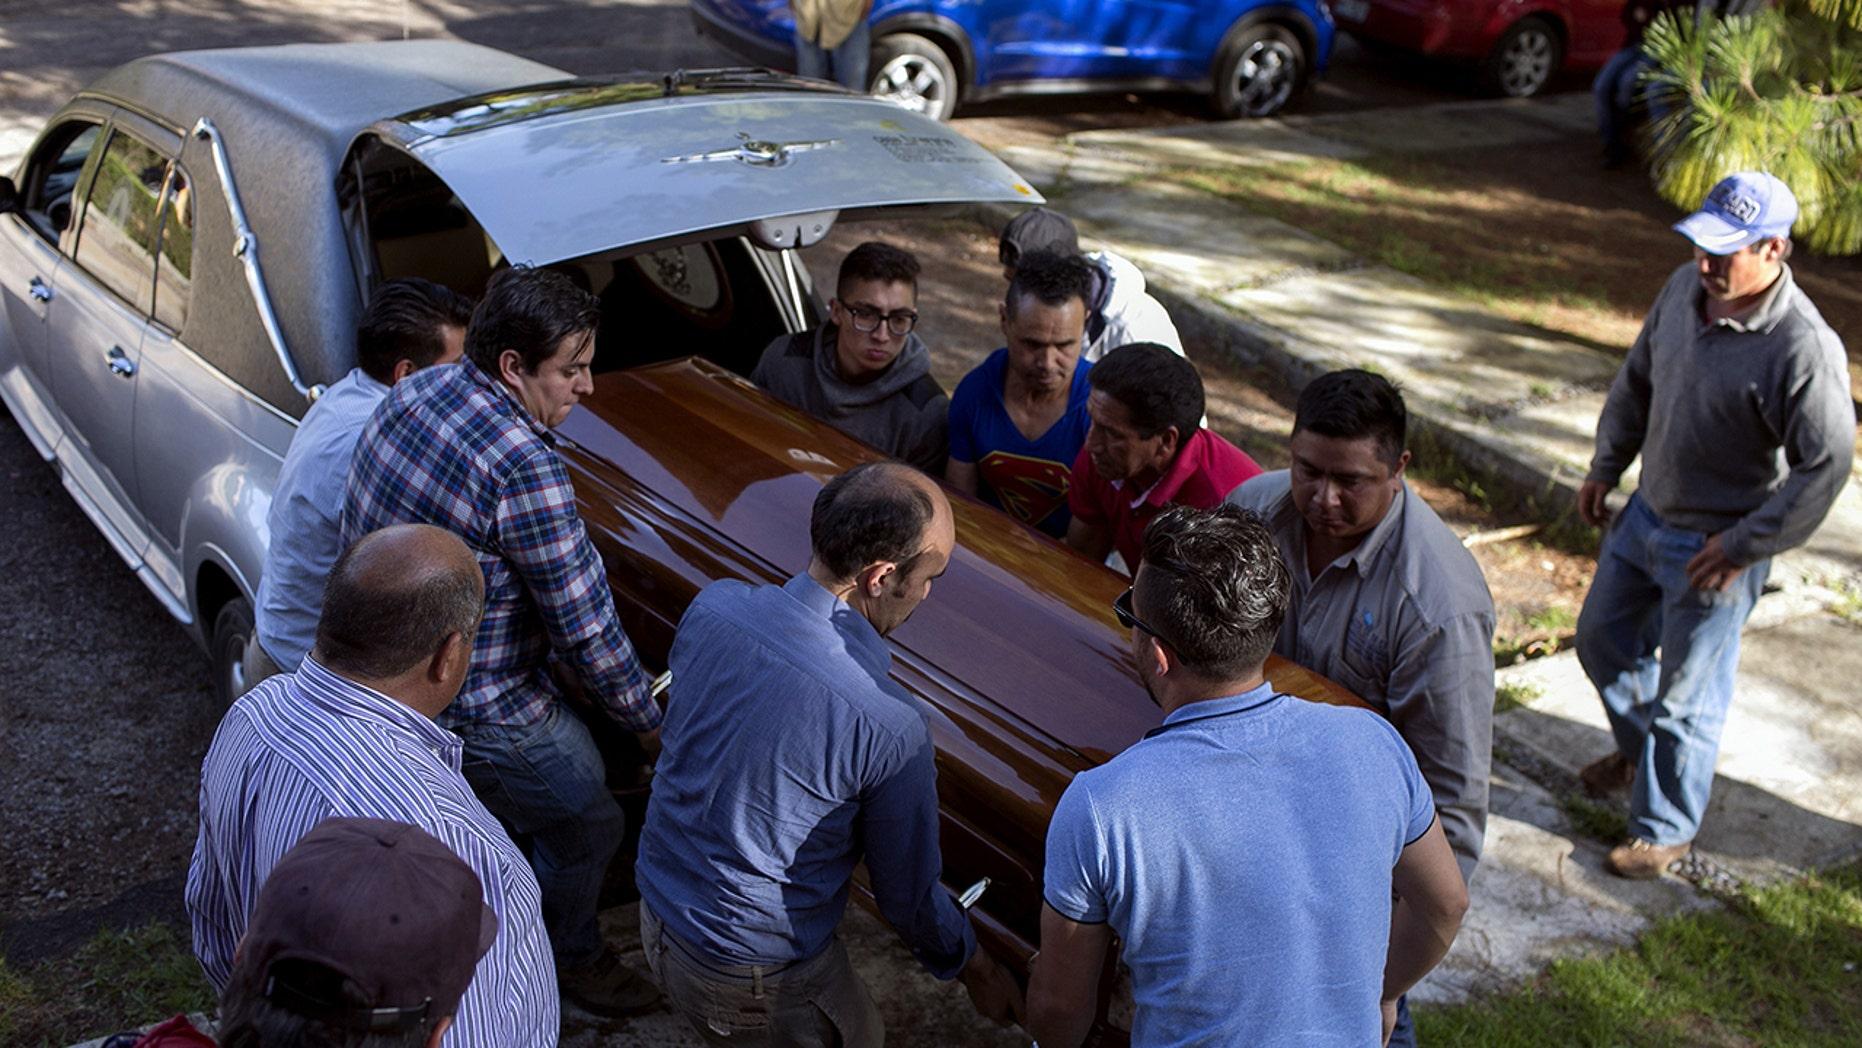 Fernando Angeles Juarez, who was running for mayor of Ocampo, was murdered.